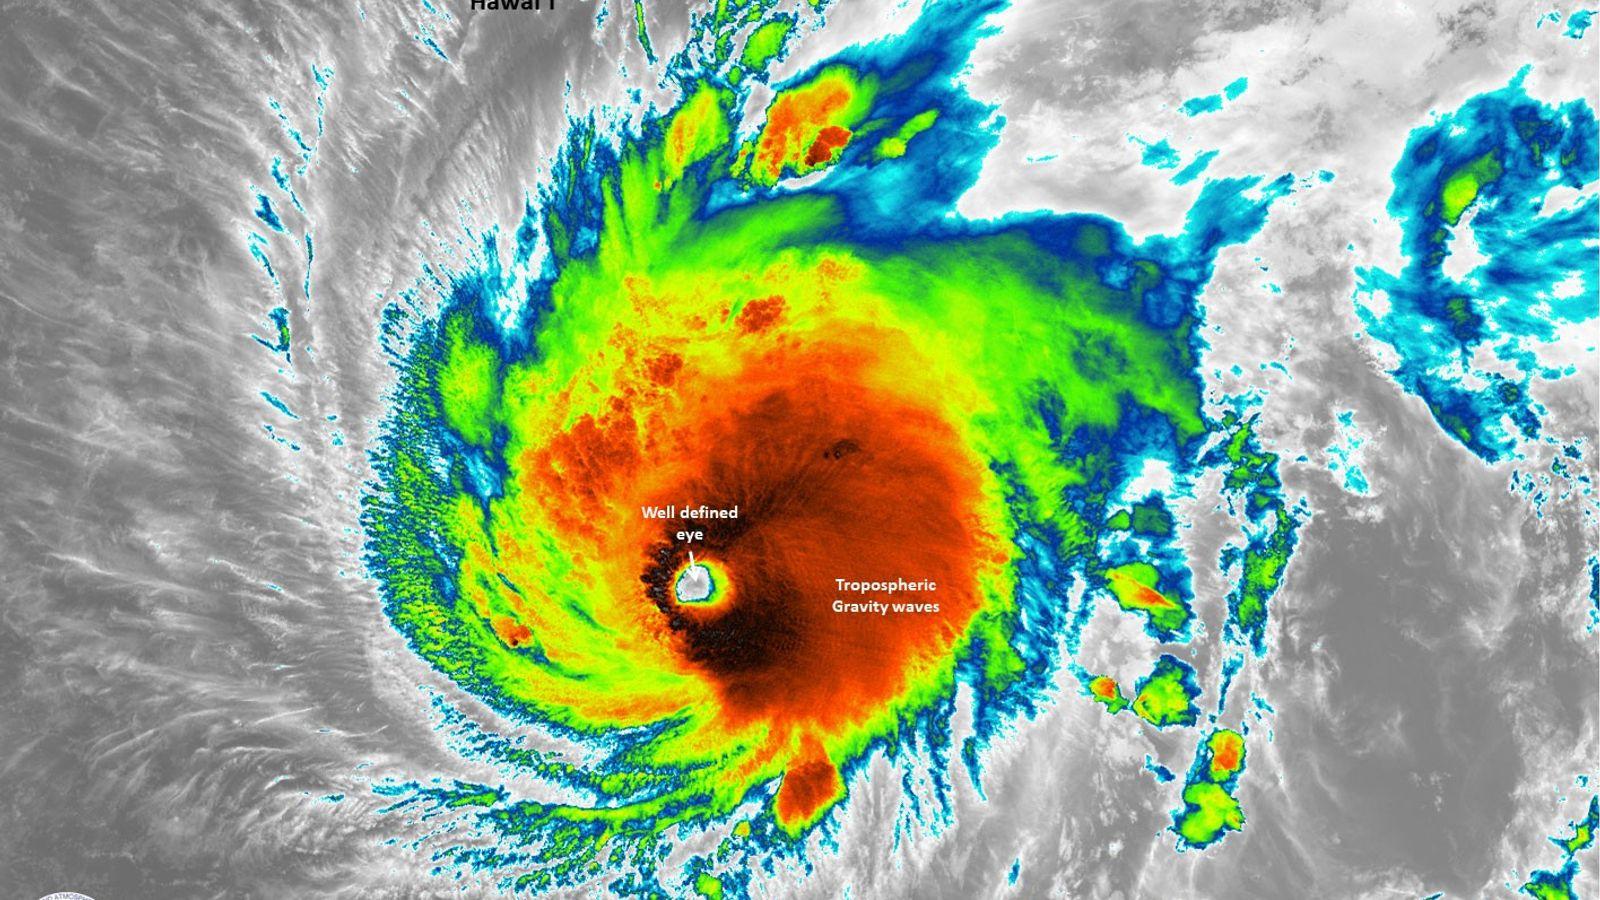 Imagen por satélite del huracán Lane